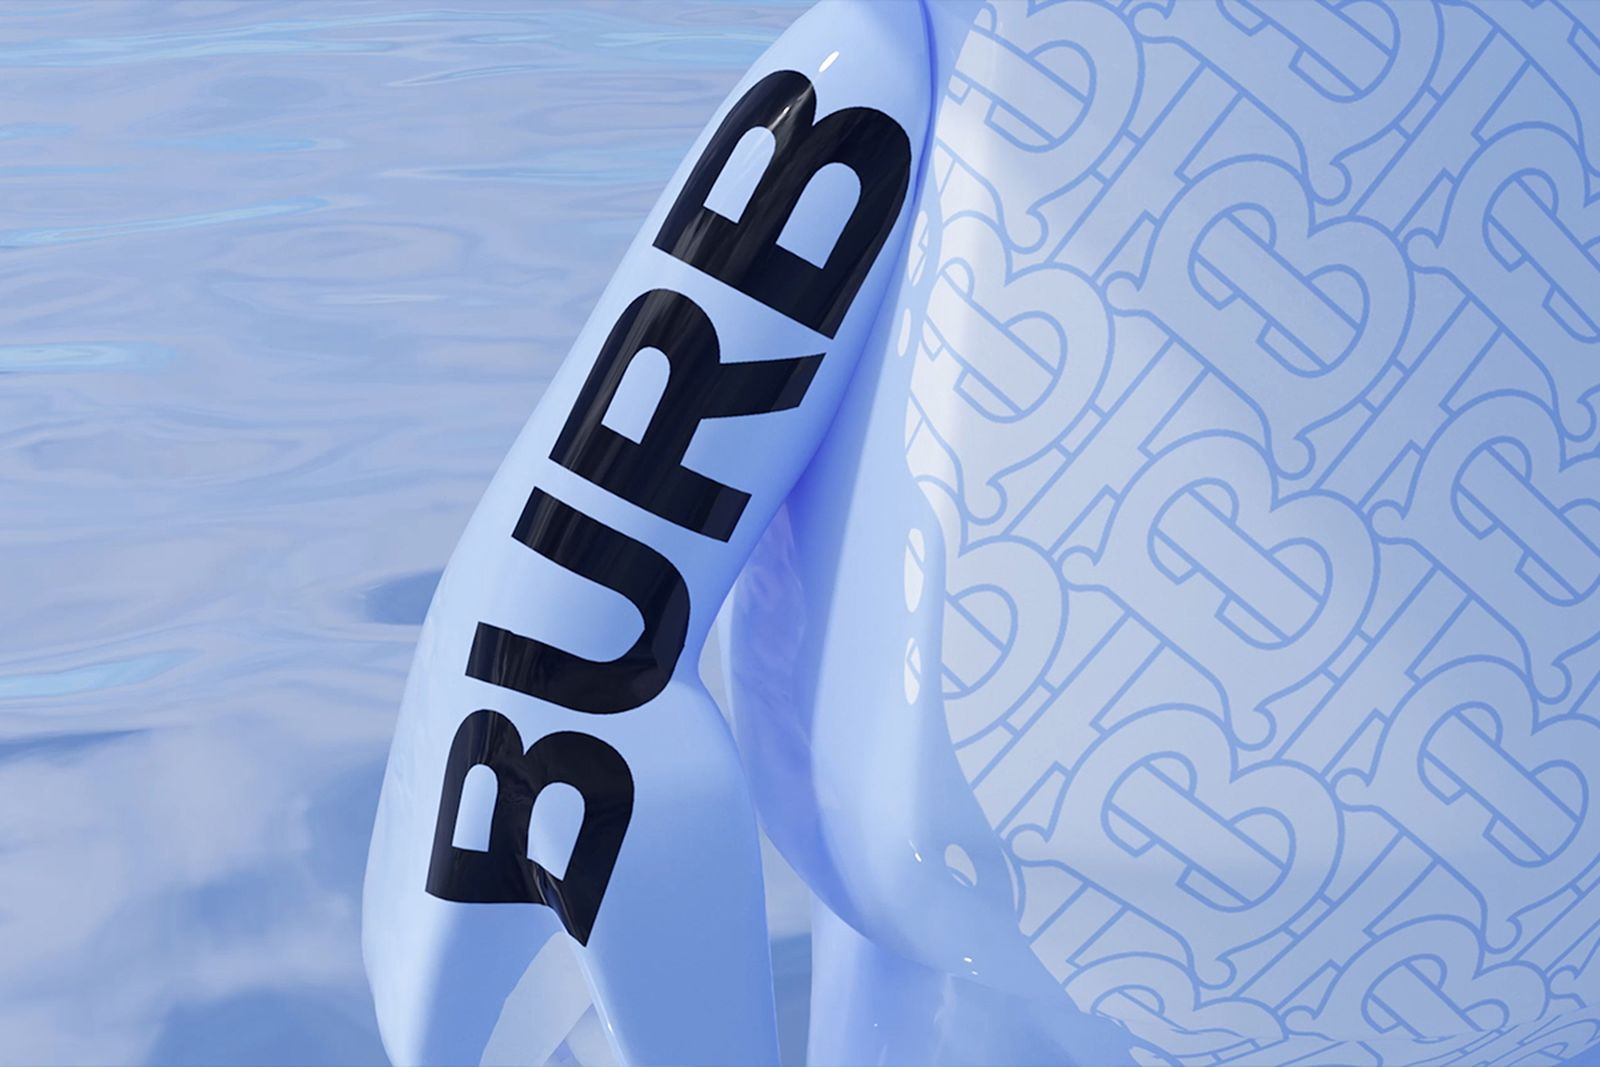 burberry-nft-blankos-block-party-03